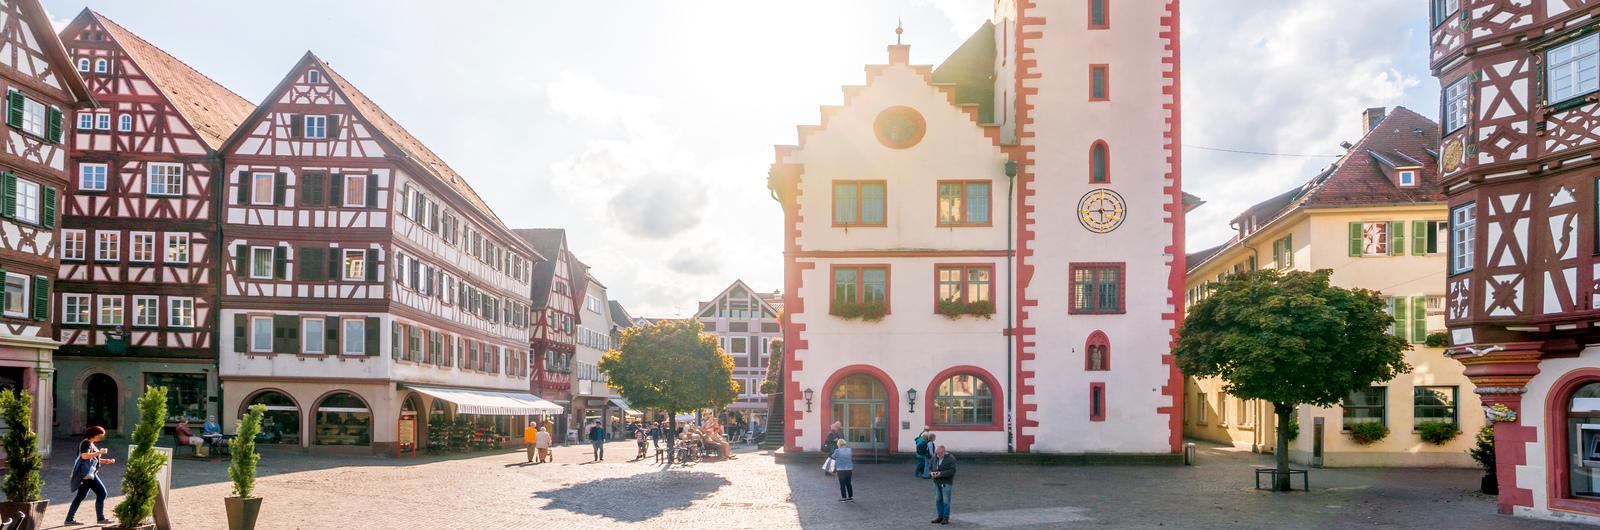 mosbach city header